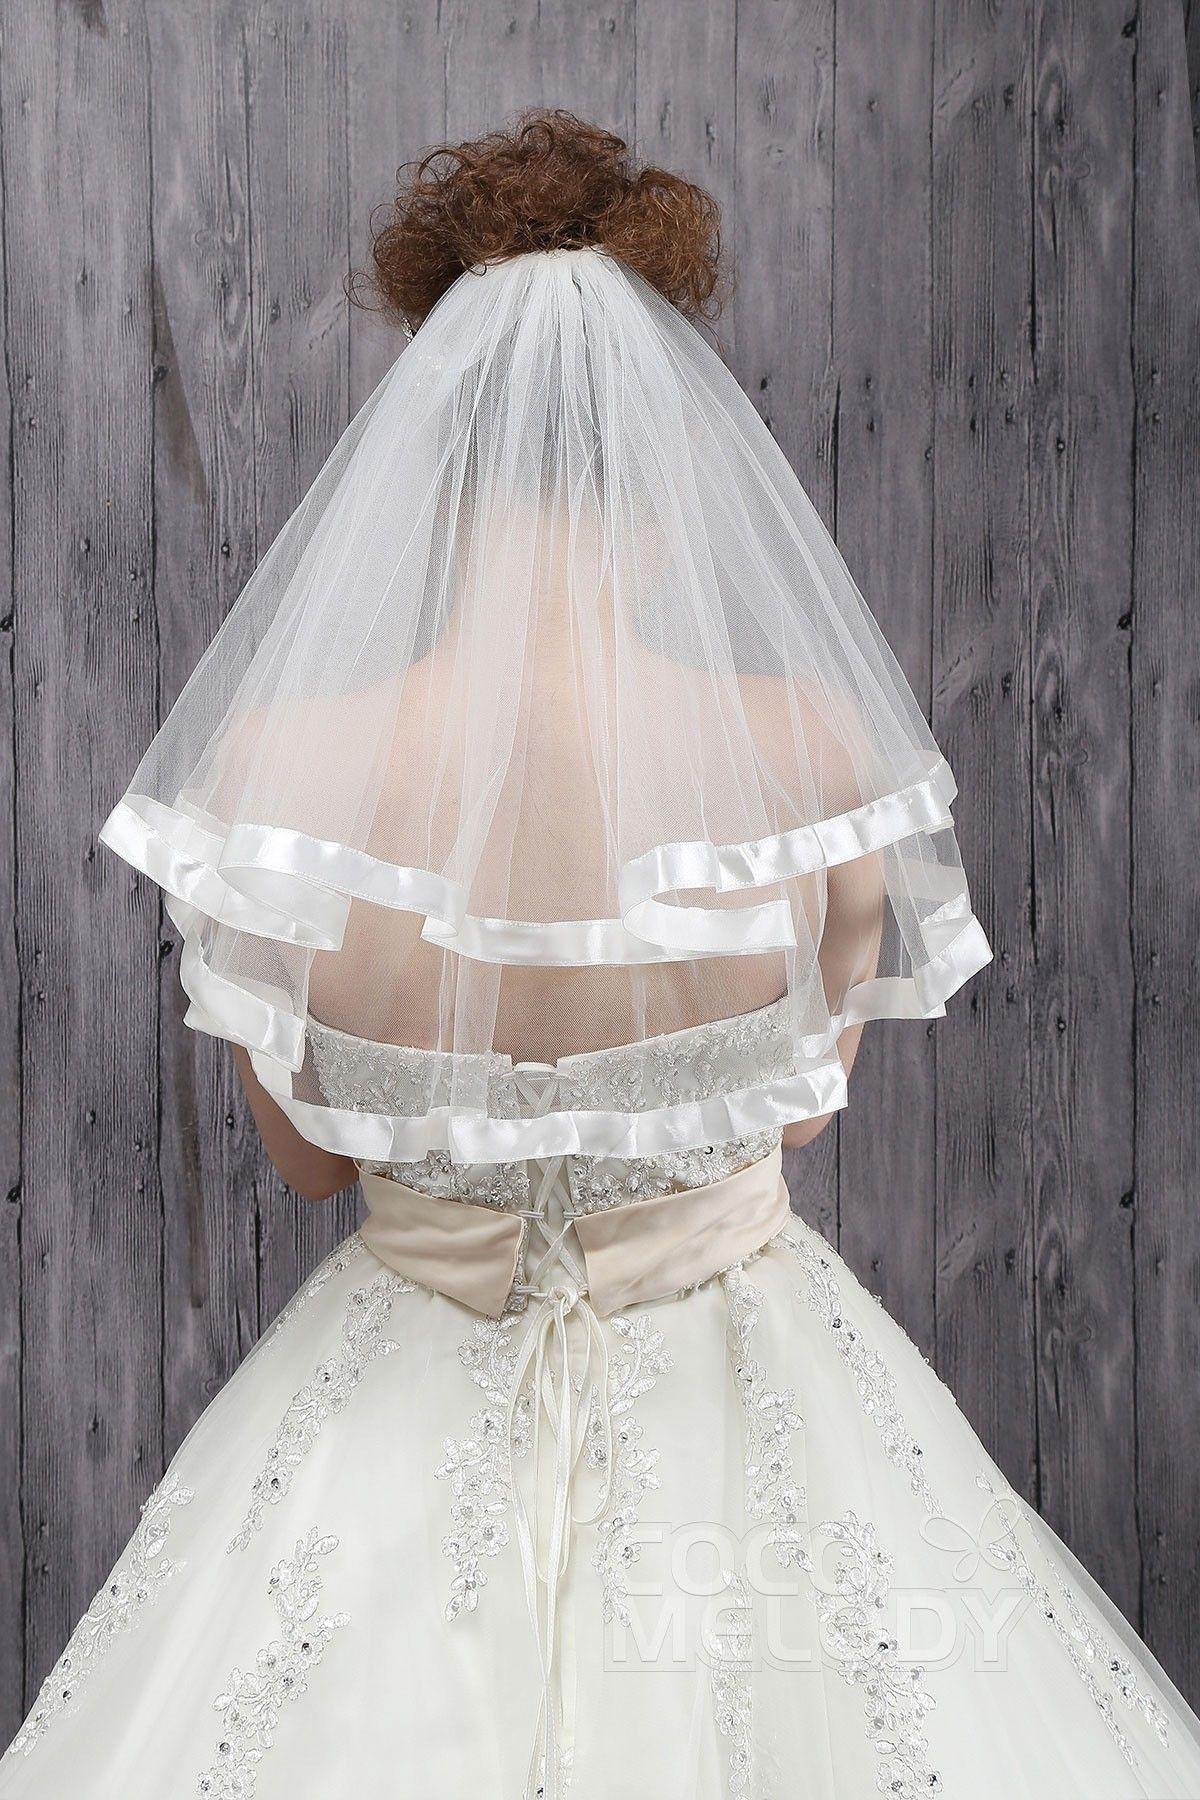 Charming Two-tier Ribbon Edge Tulle Ivory Elbow Veils CV0015010cocomelody#weddingveil#bridal#veil#